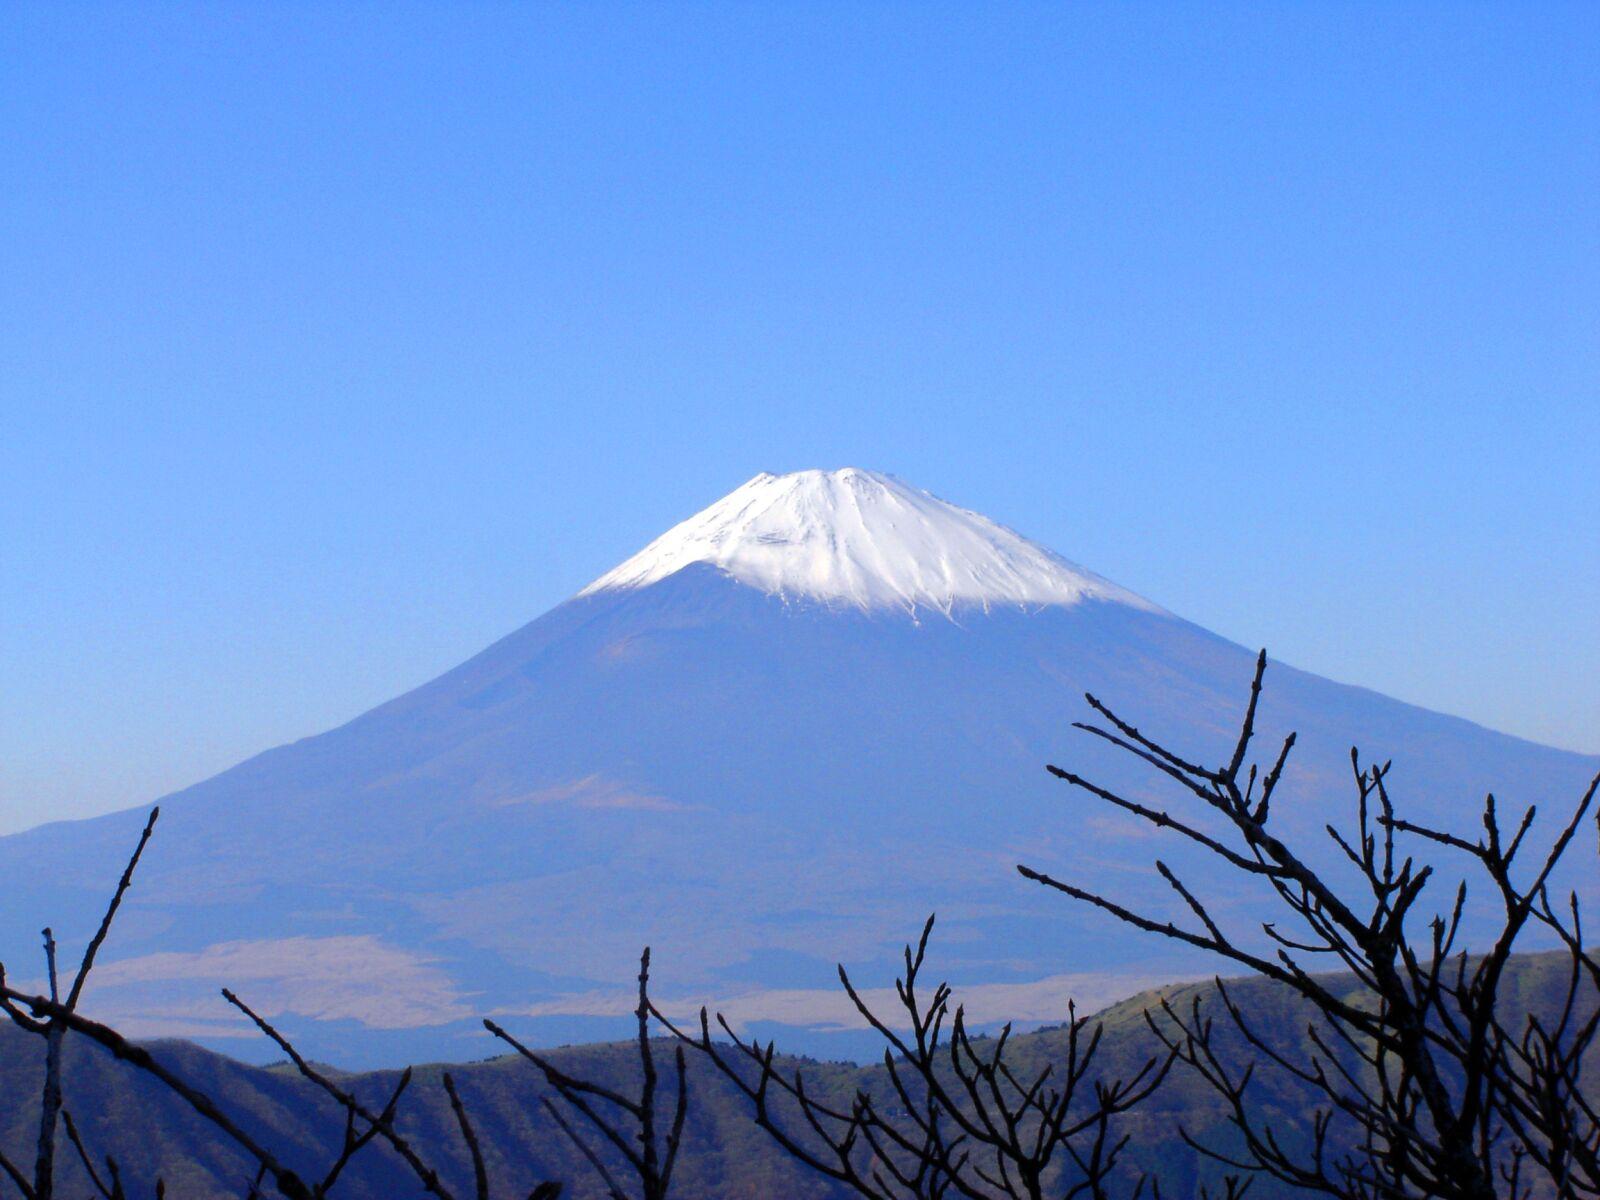 fuji, mountain, japan